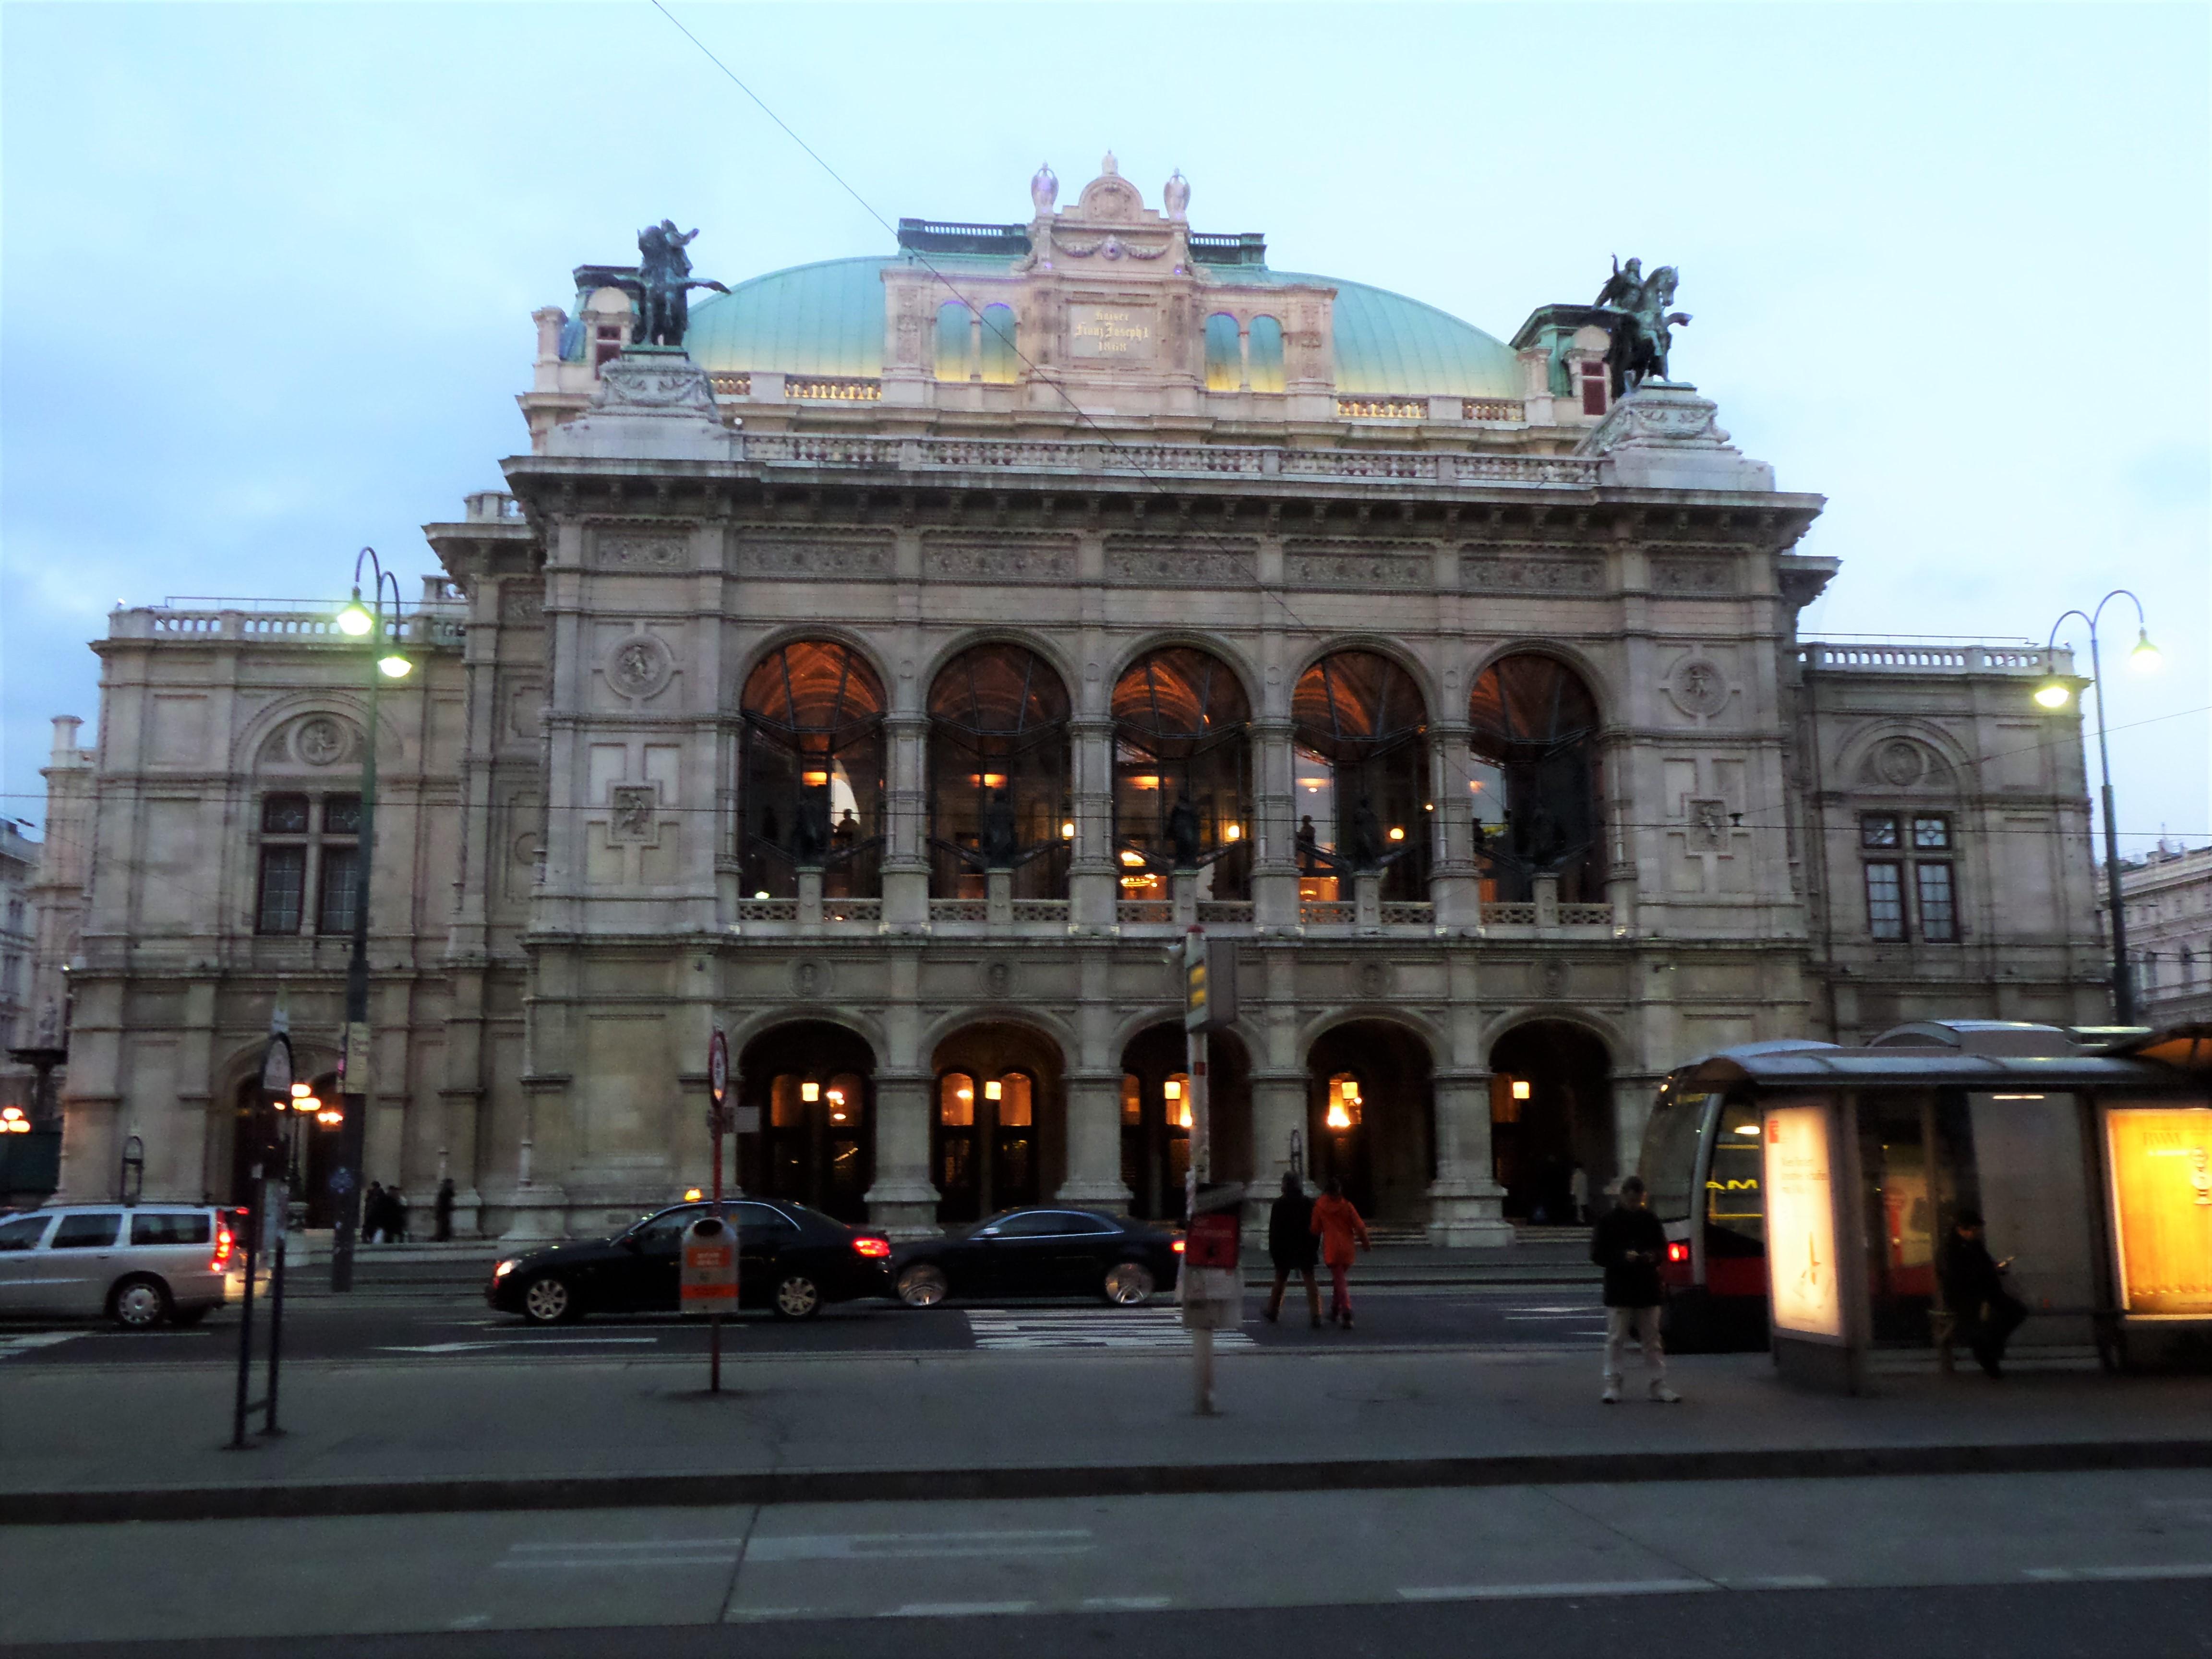 Vienna State Opera's impressive neoclassical building